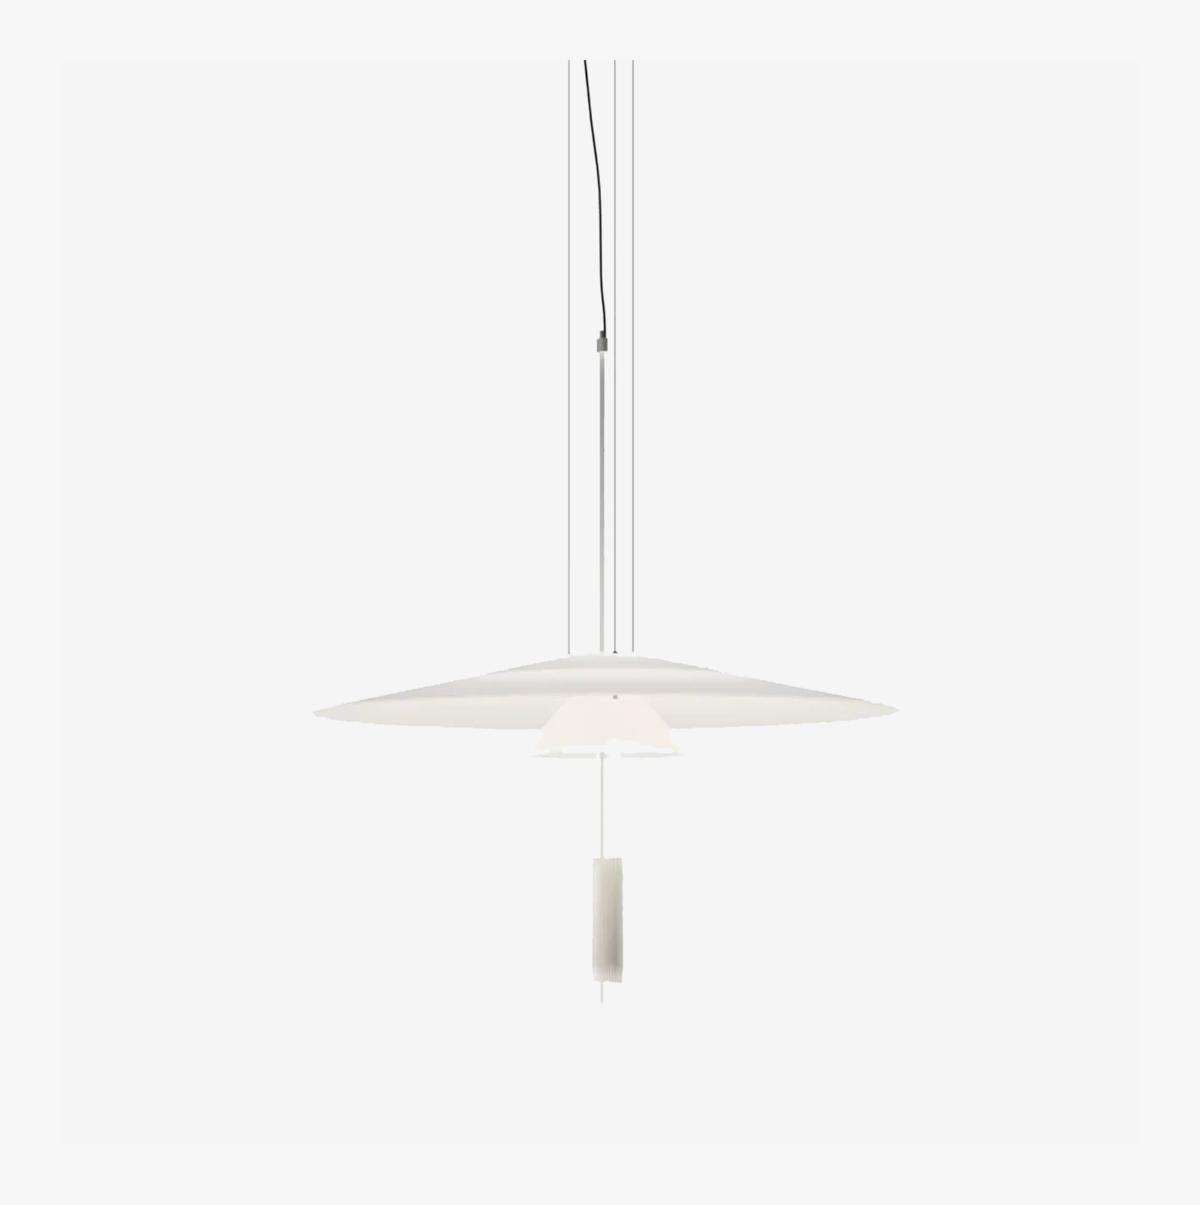 Lámpara colgante Flamingo 1515 blanco satinado Vibia-0